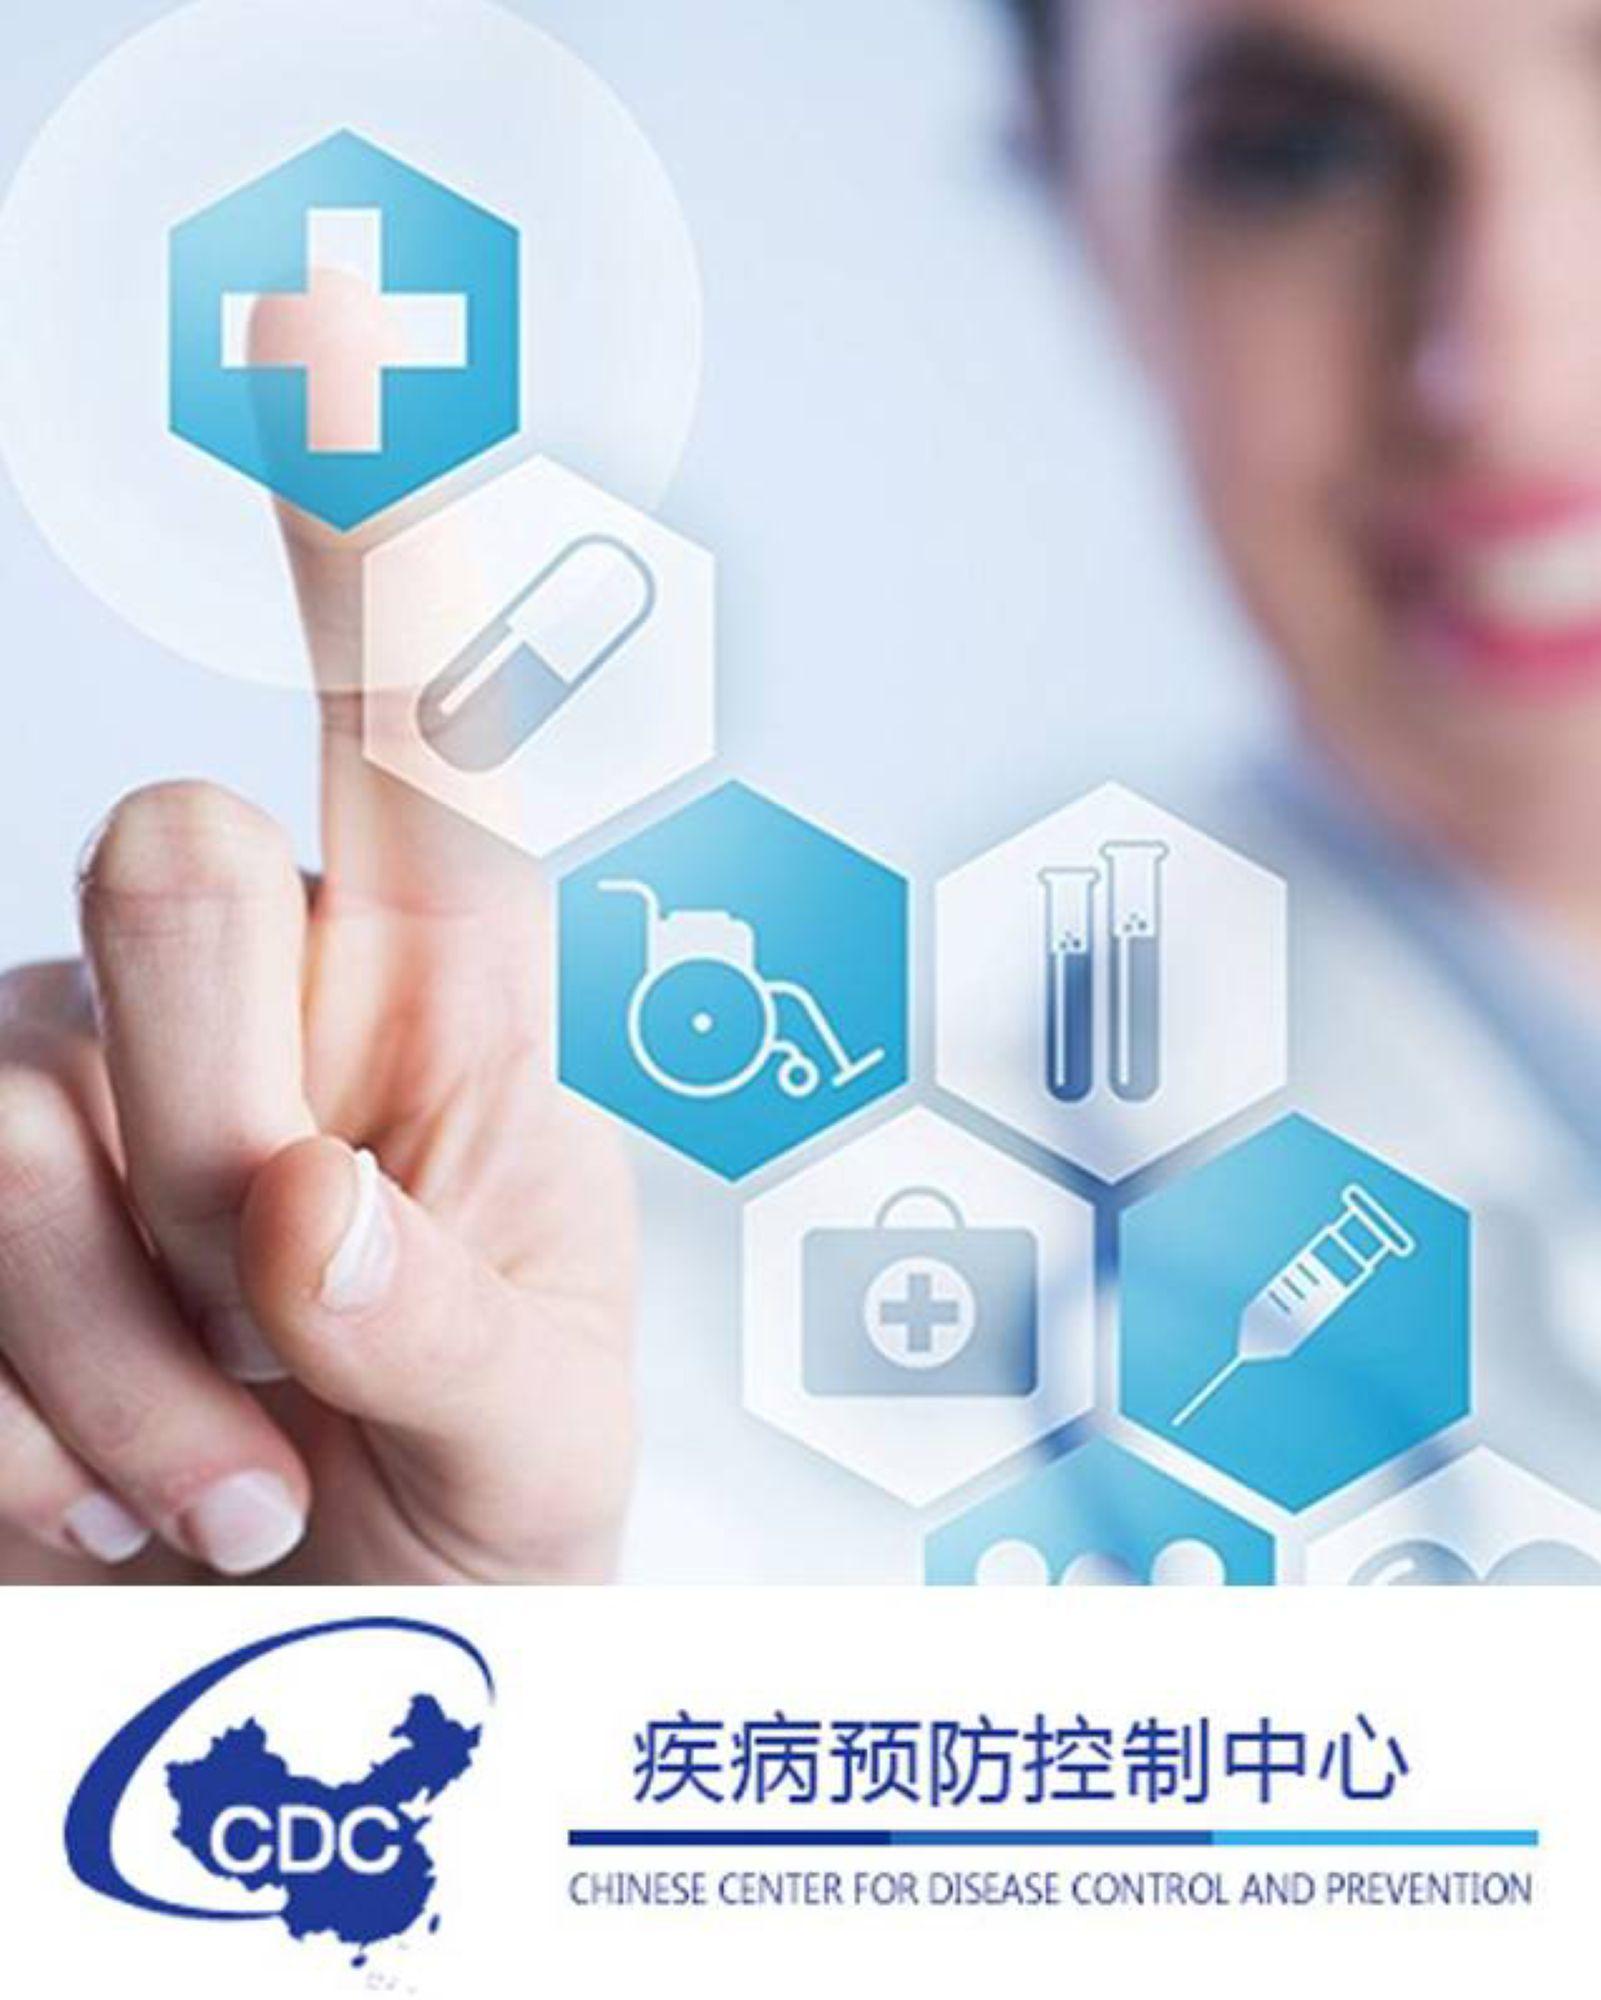 CN_202004_ph_localcontent_Saveris_Vaccine_development-CCDC.jpg